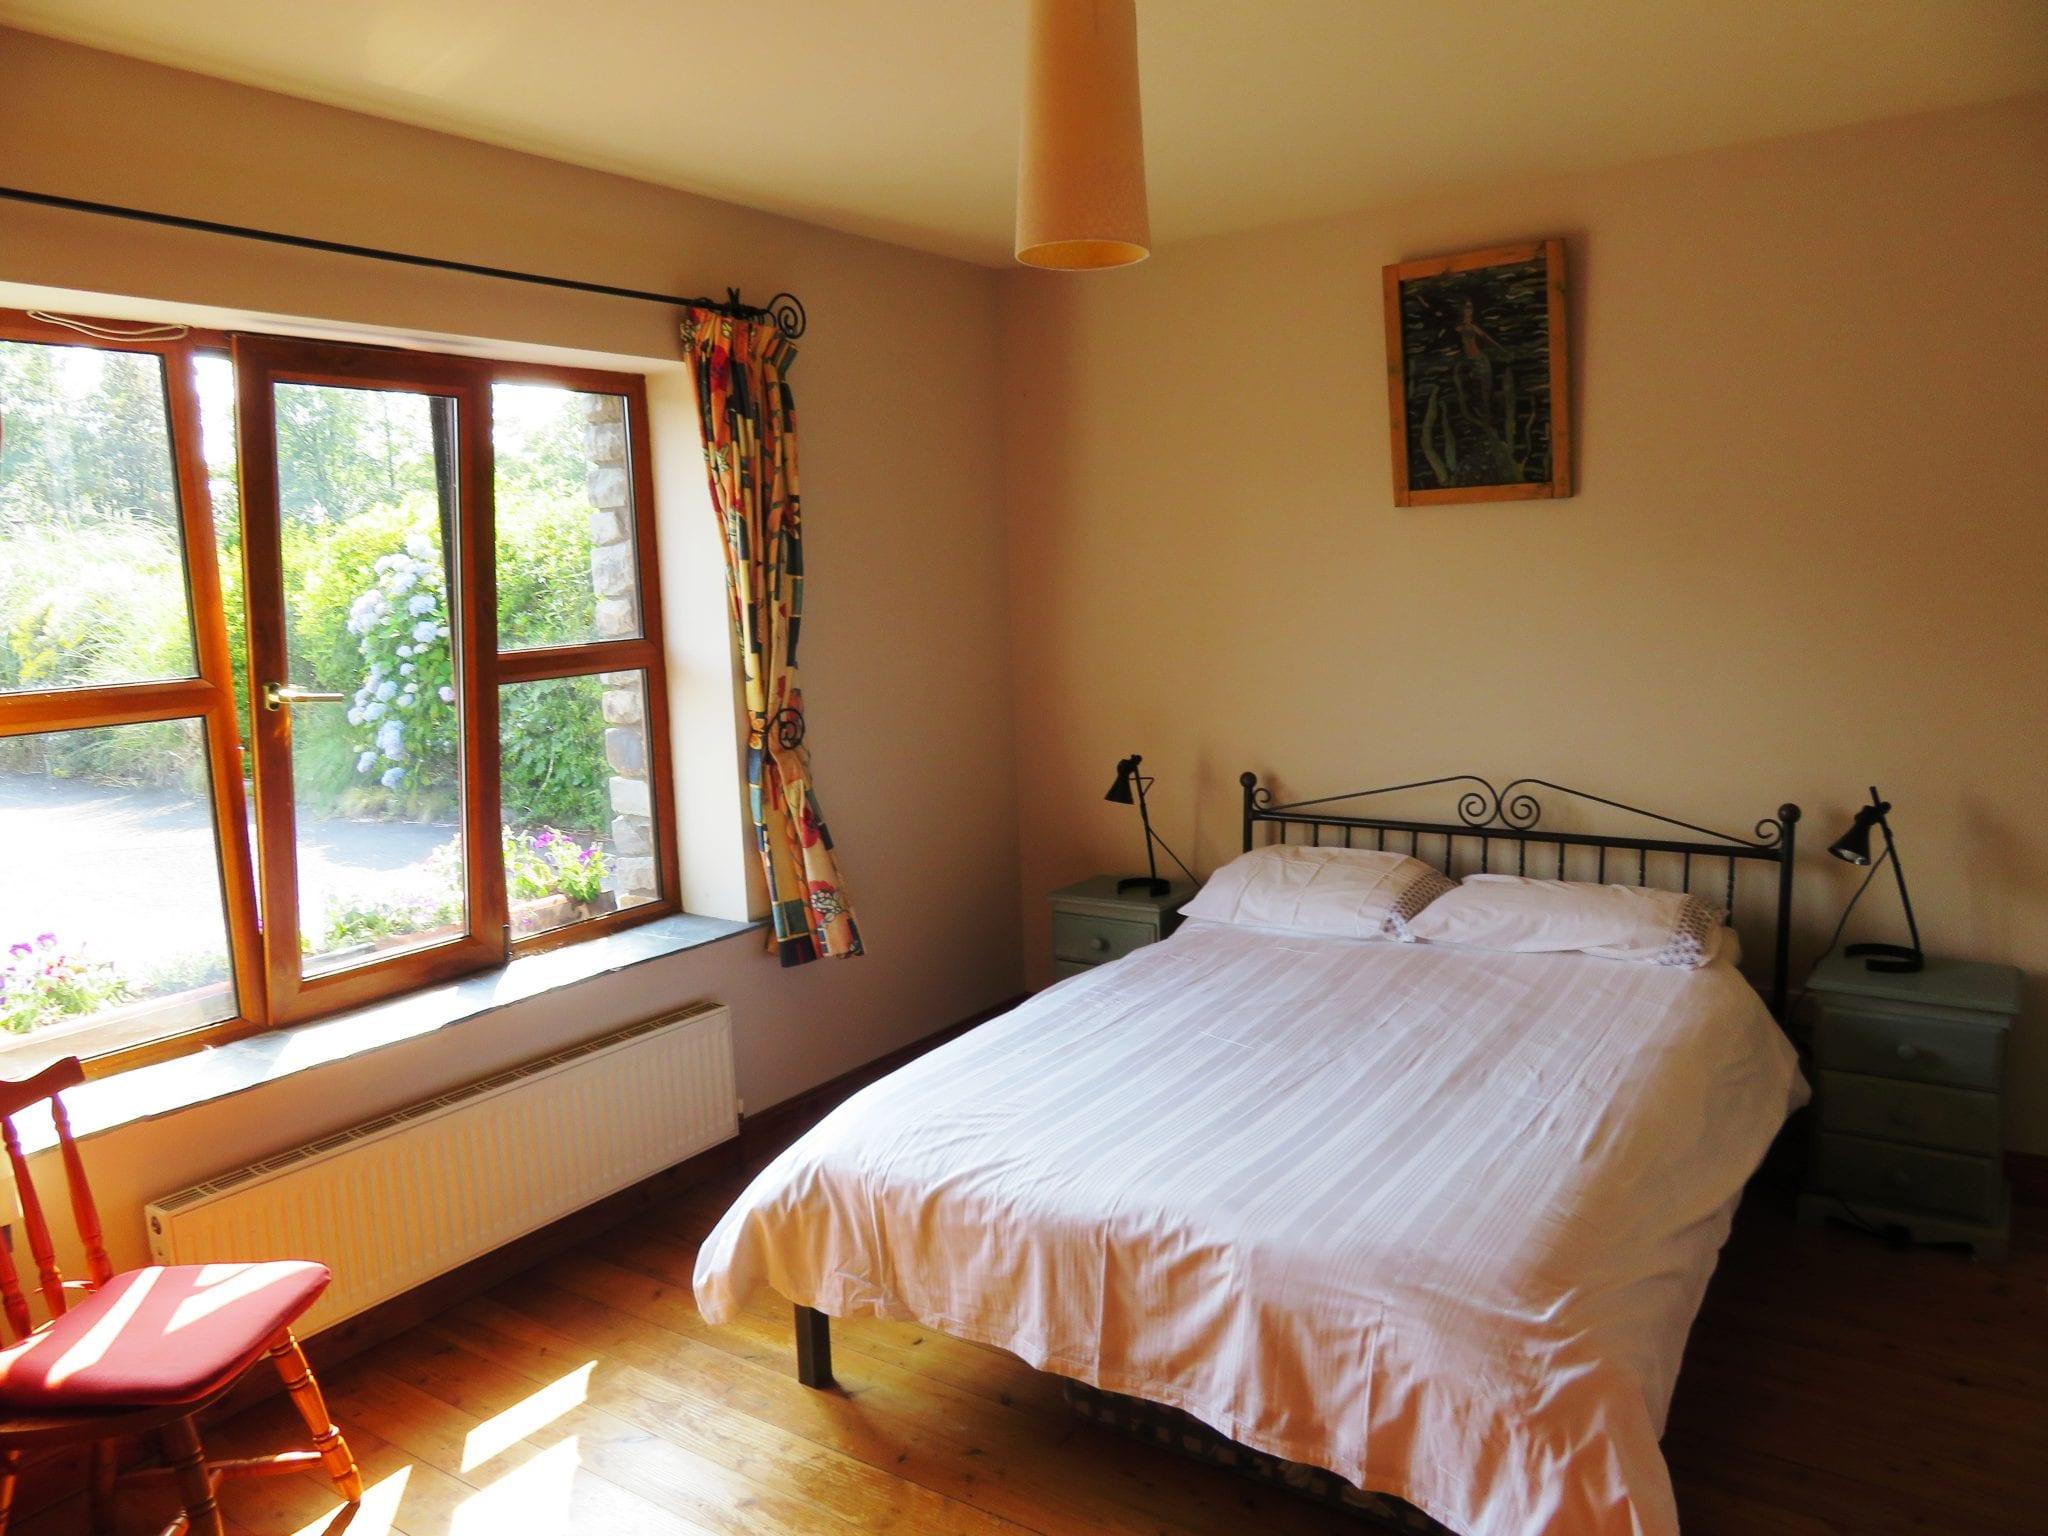 IMG_0011 Bedroom 1